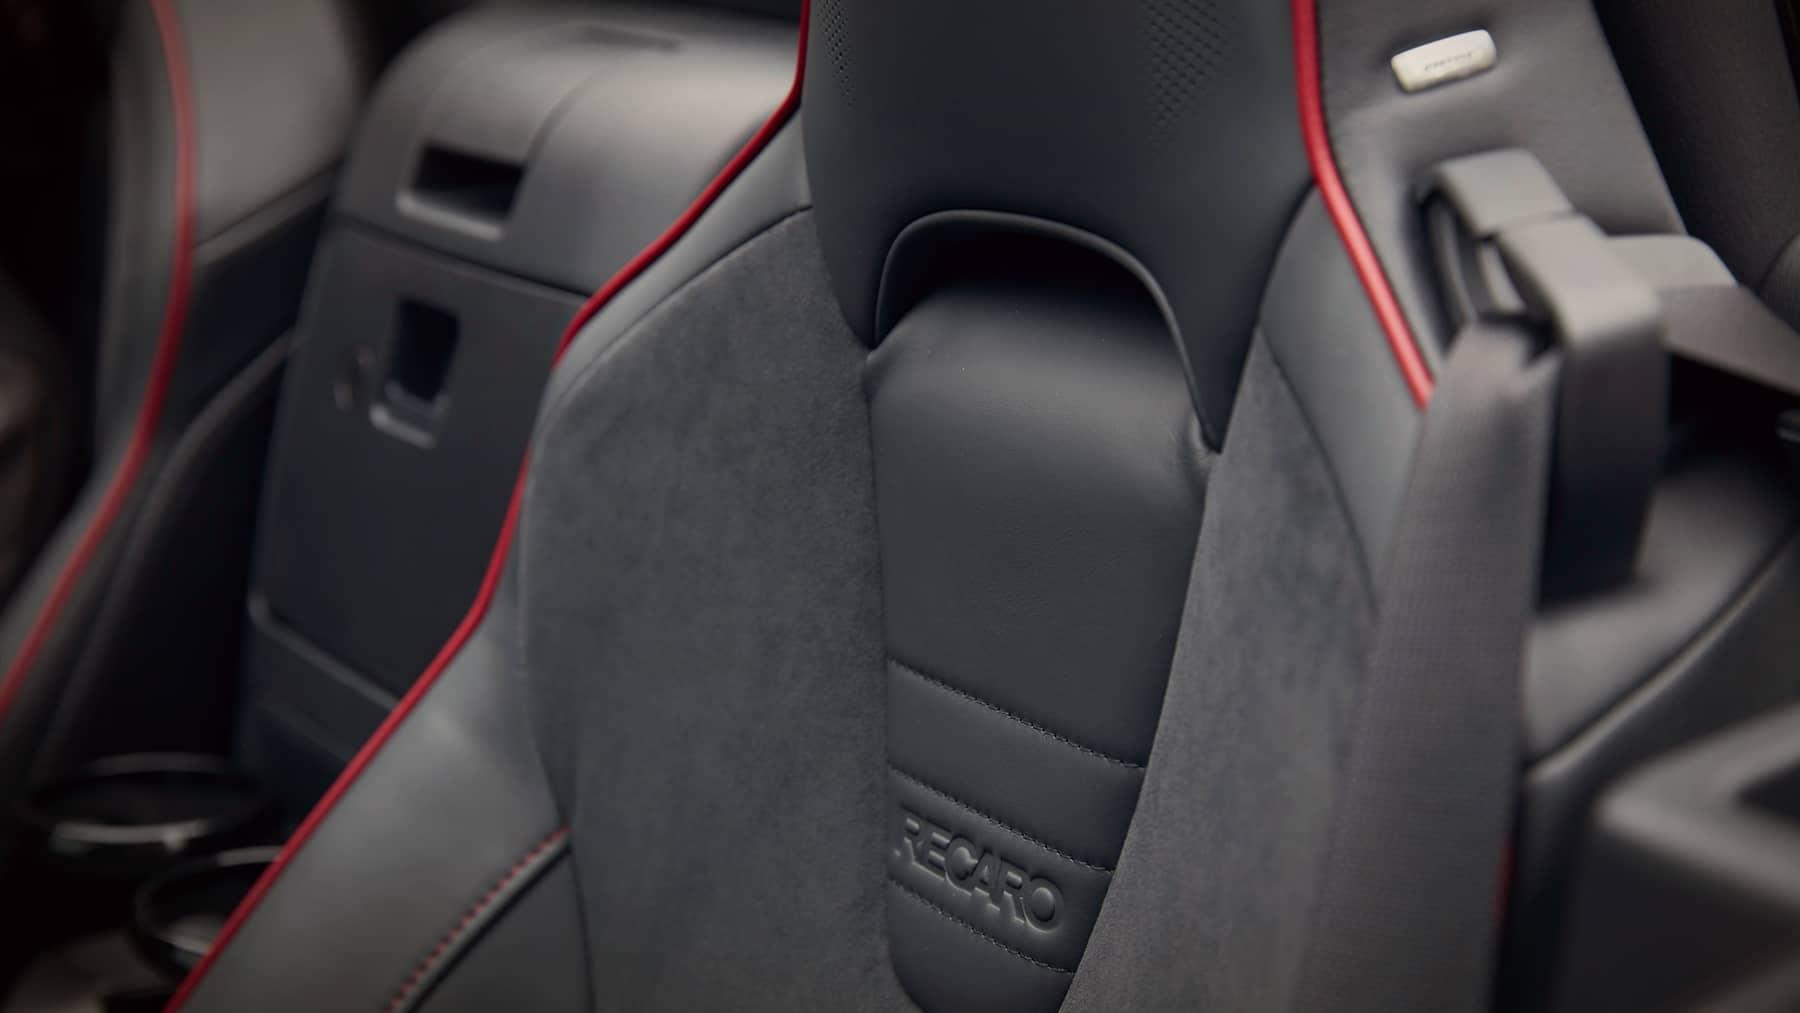 2019 Mazda MX-5 Miata sport seats